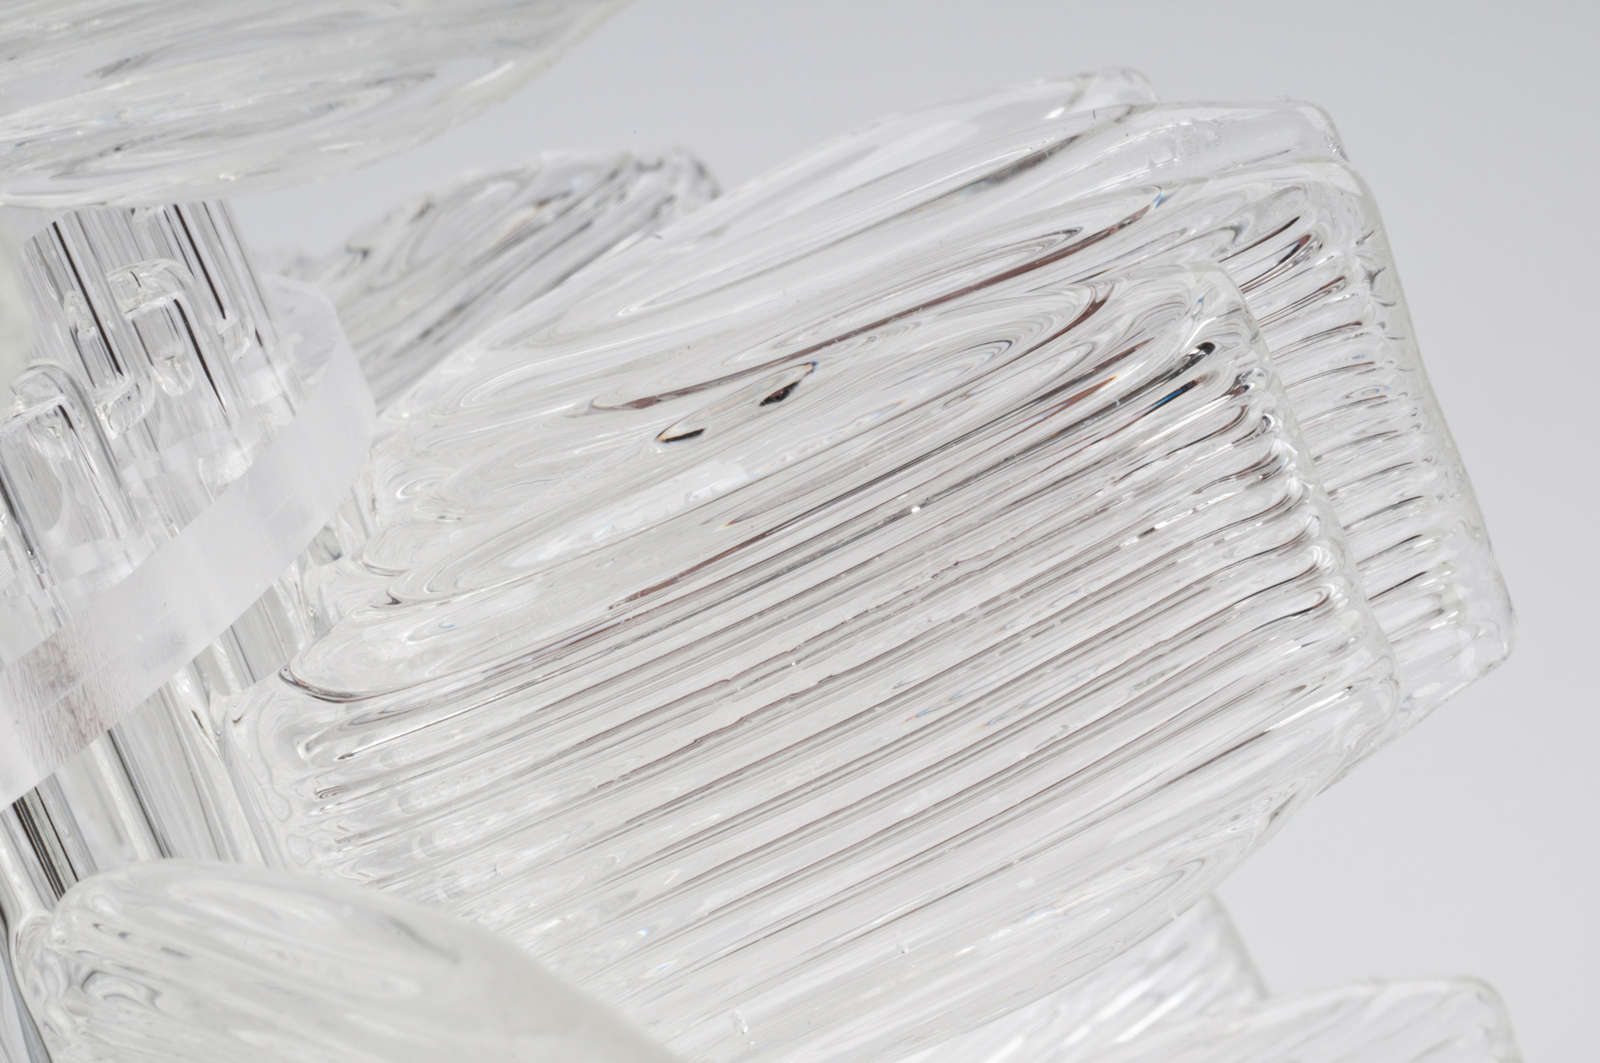 anemone-20-table-chrome-cristal-crystal-veronese-maurizio-galante-tal-lancman-41.jpg